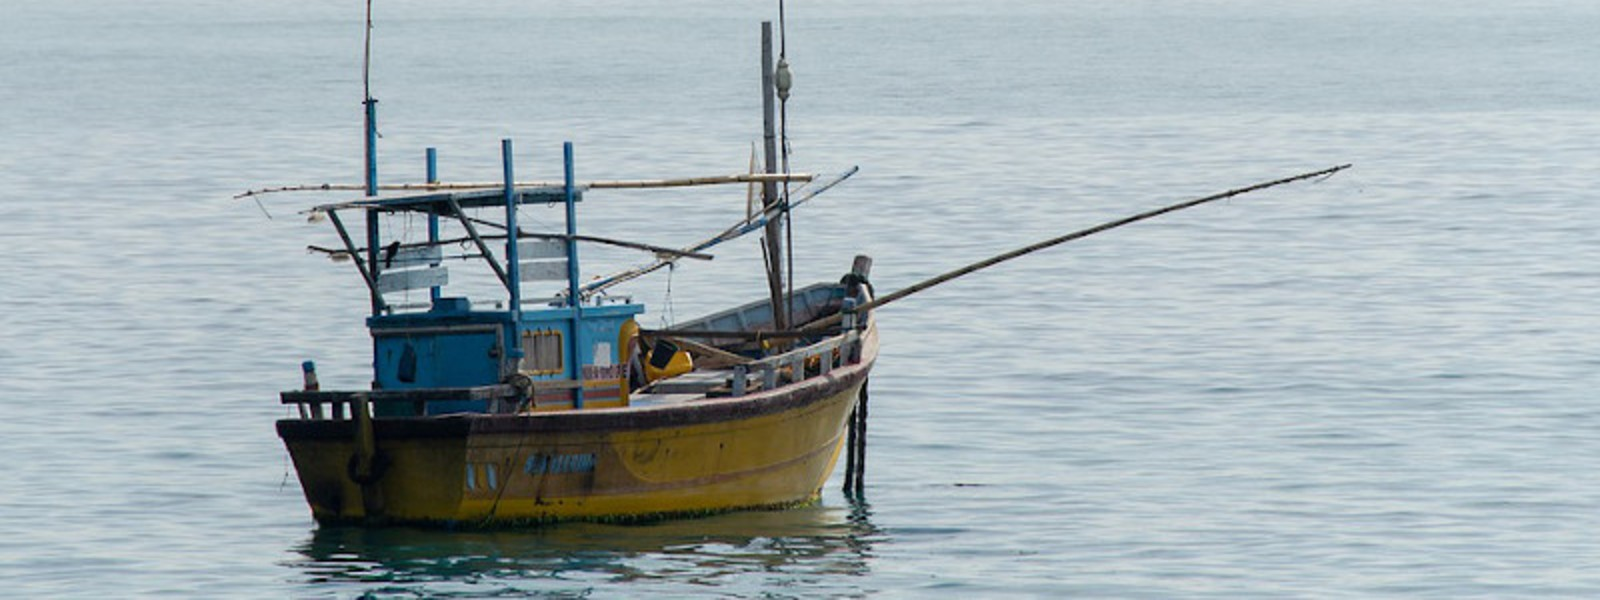 Myanmar to release detained Sri Lankan fishermen